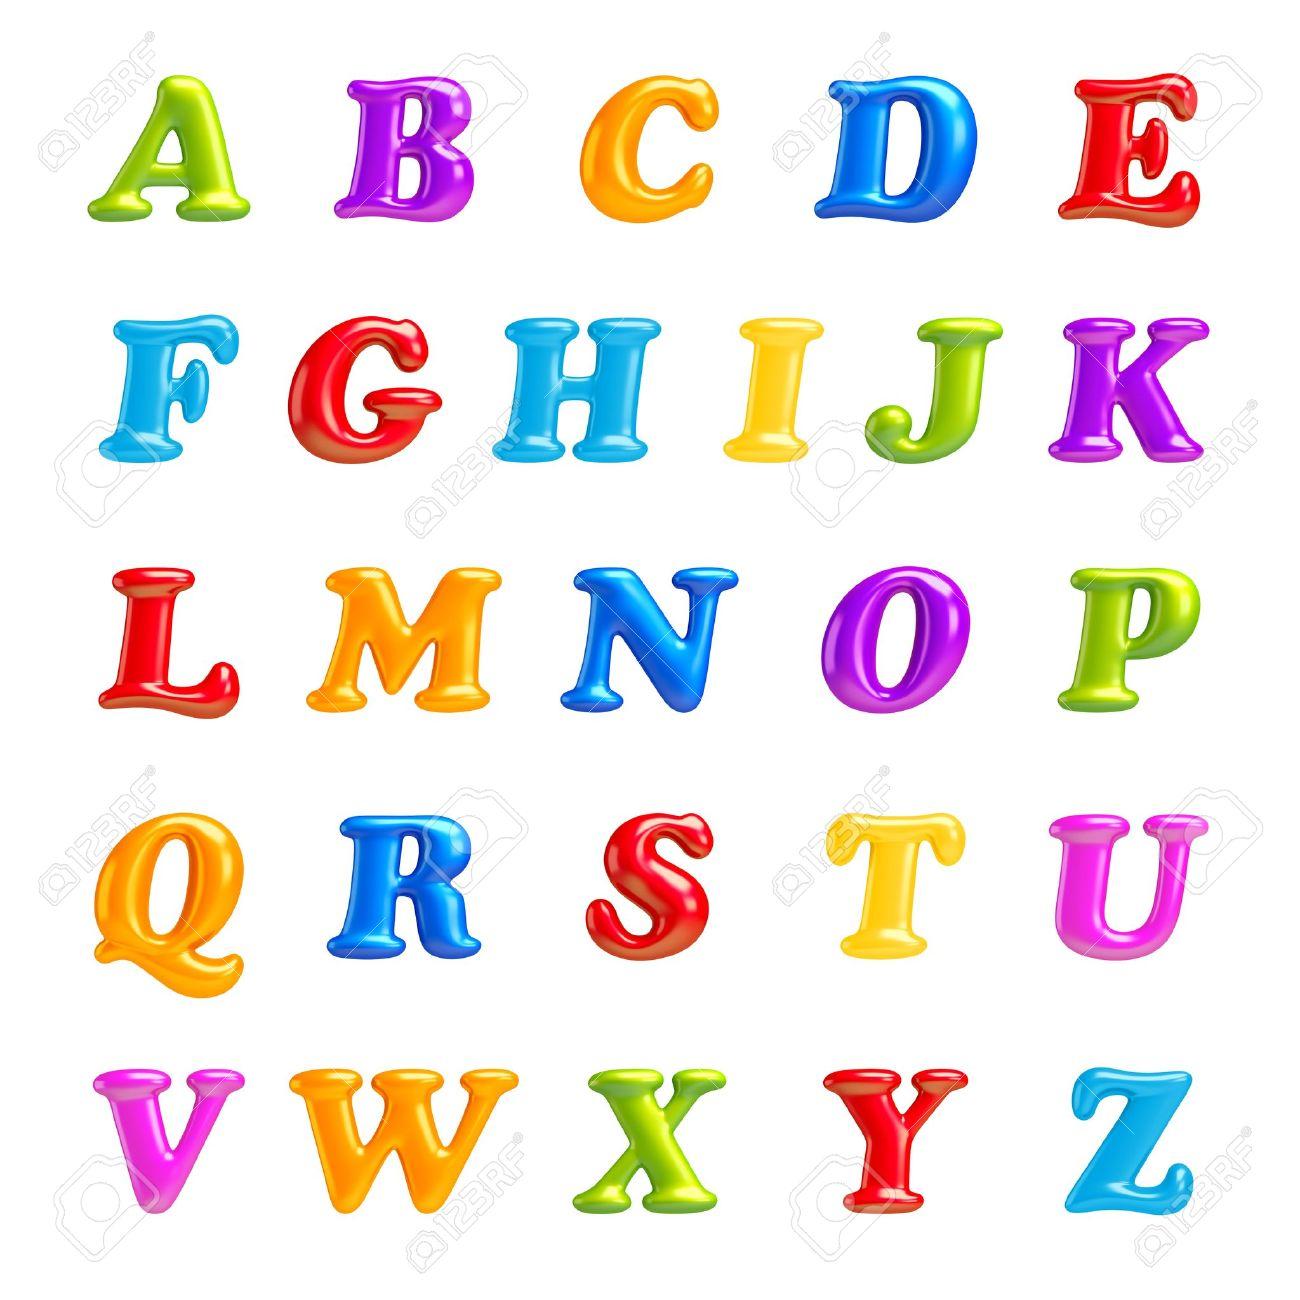 3d font creatieve abc collectie gesoleerde alphabet type letters 3d font creatieve abc collectie gesoleerde alphabet type letters met cijfers en symbolen hoge kwaliteit schone scherpe letters a b c d e f g h i expocarfo Choice Image